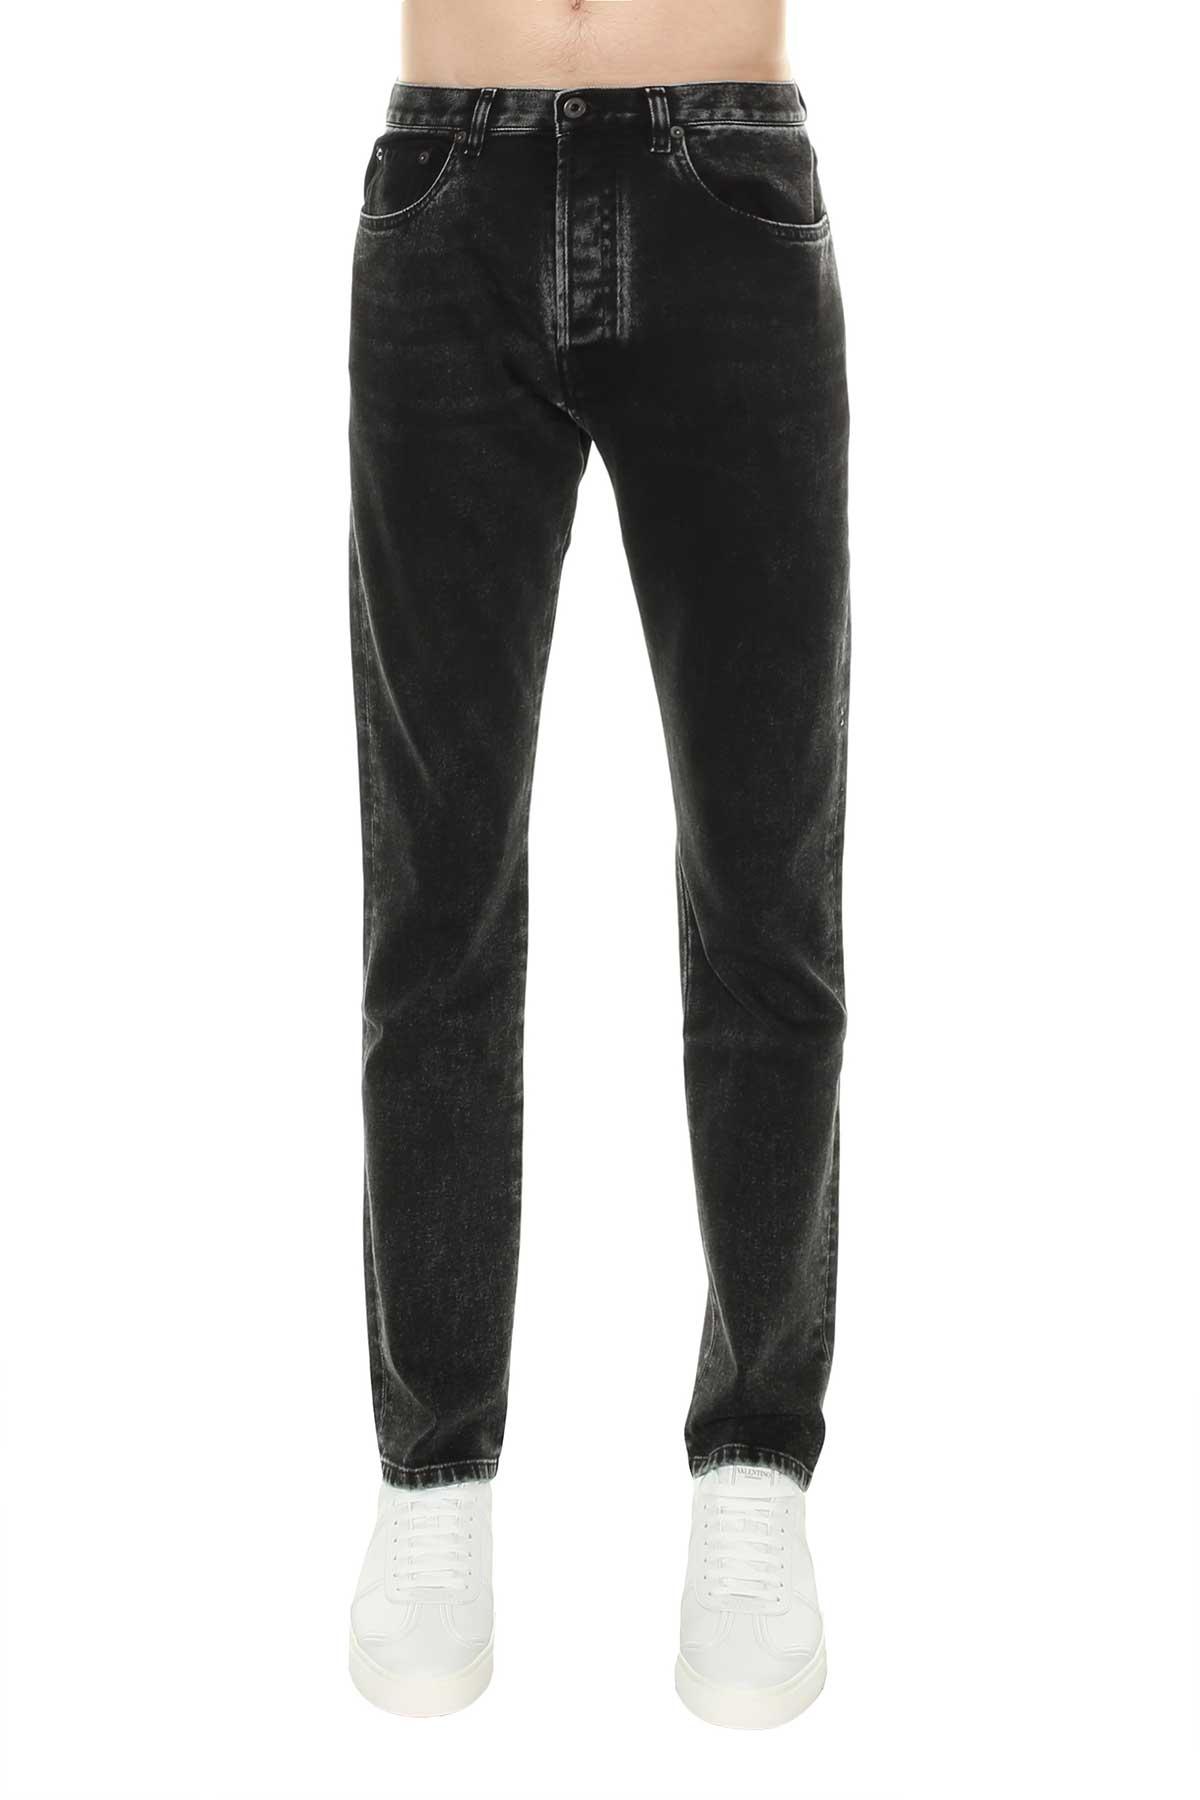 Valentino Valentino Slim Jeans 10496271